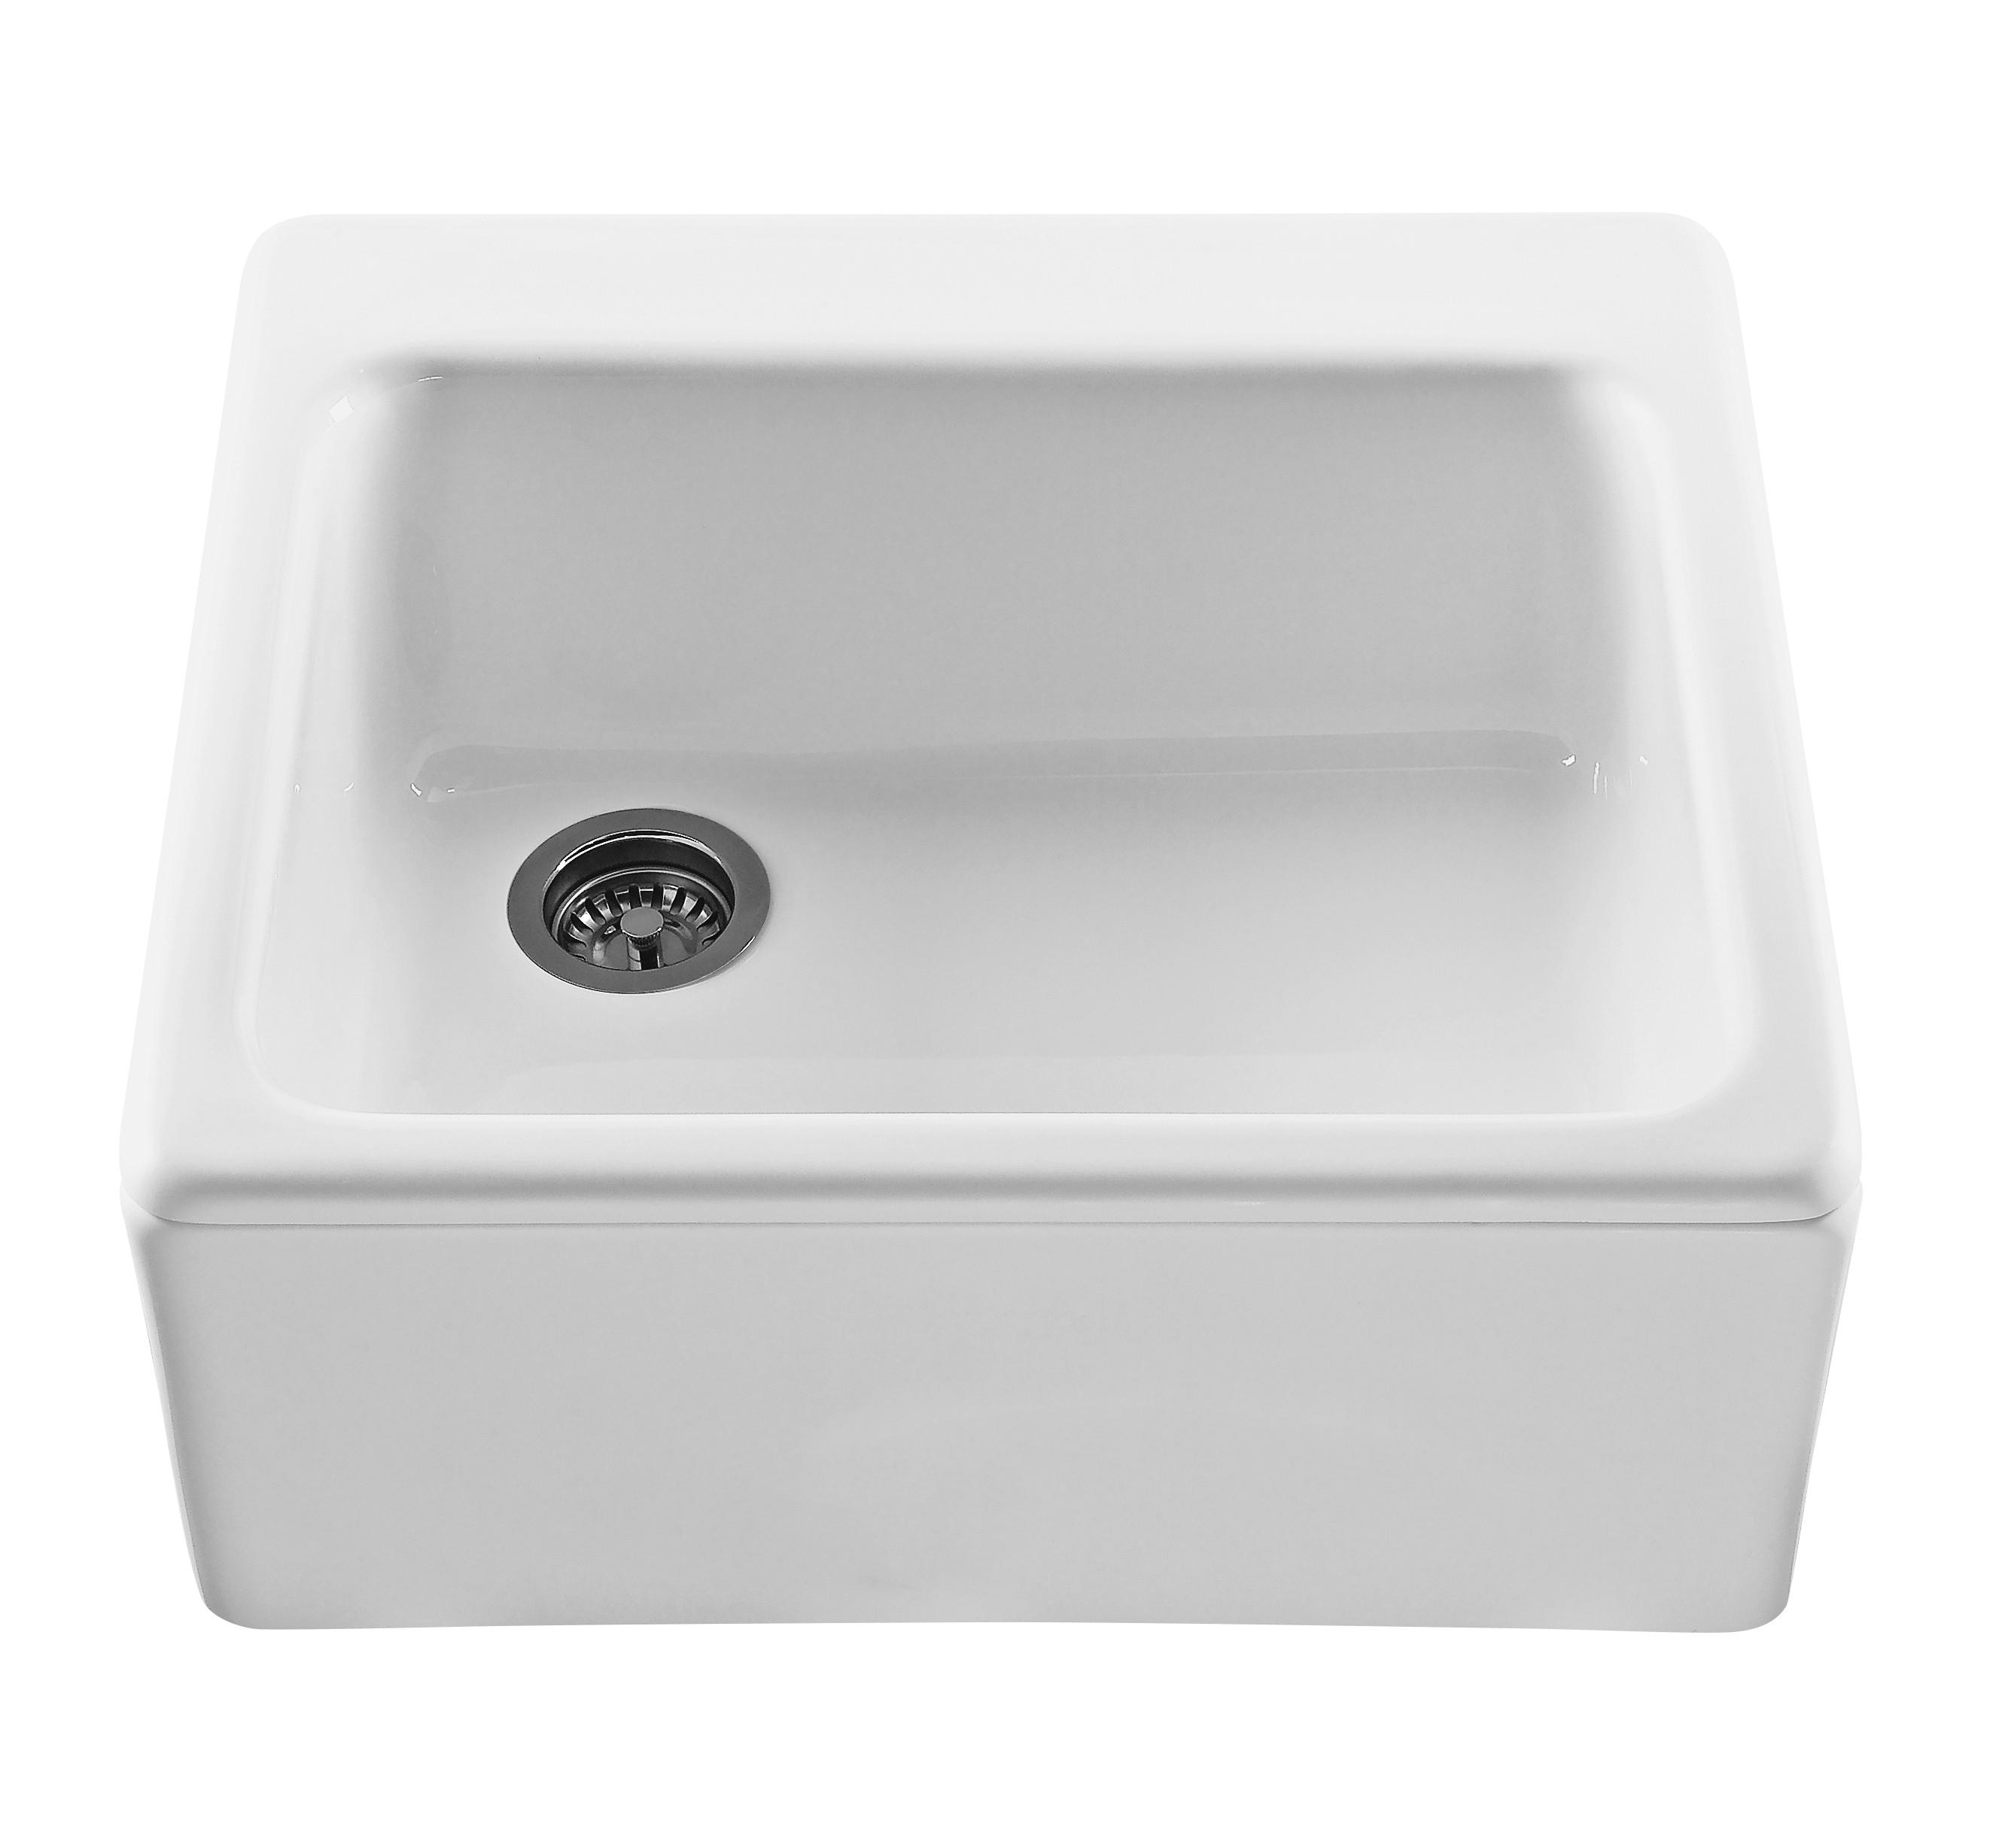 Reliance RKS240 The Hatfield Single Bowl Farmhouse Style Kitchen Sink